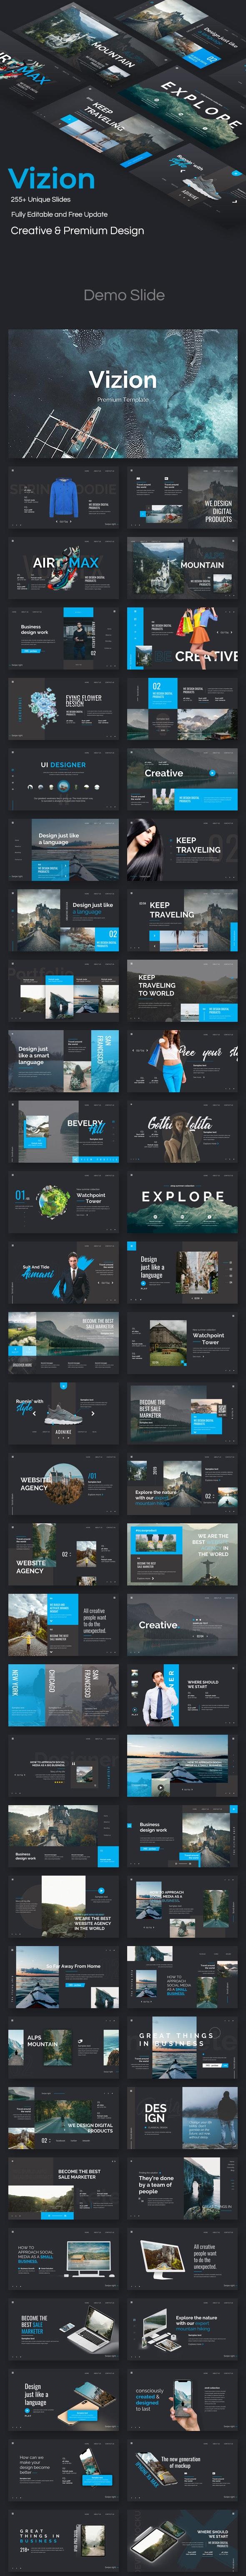 Vizion Premium Keynote Template - Creative Keynote Templates